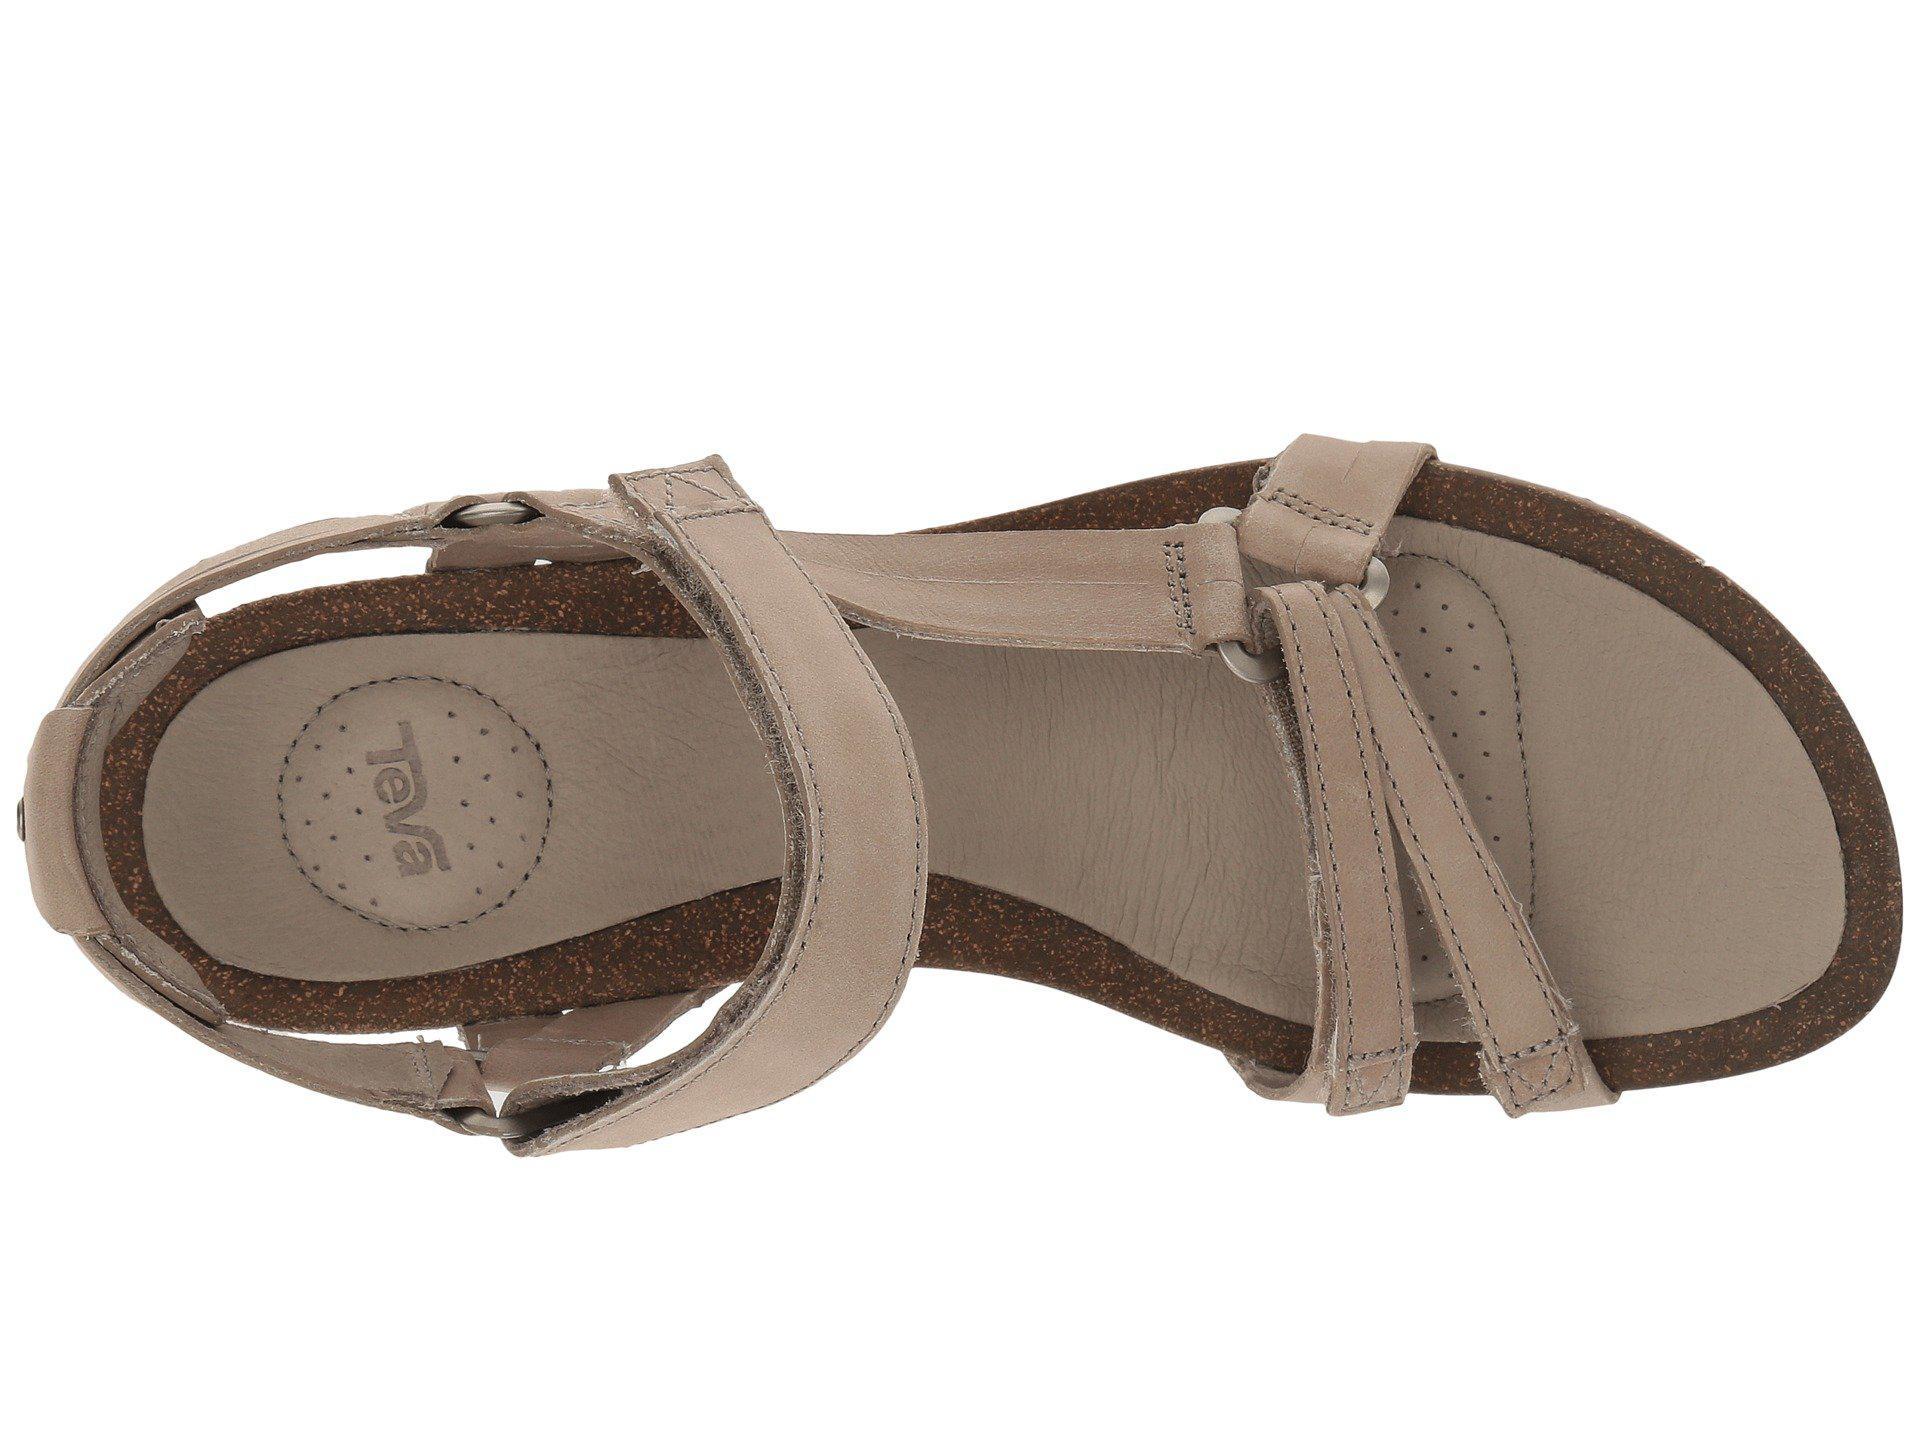 11763e510543 Teva - Brown Ysidro Universal Wedge (taupe) Women s Wedge Shoes - Lyst.  View fullscreen